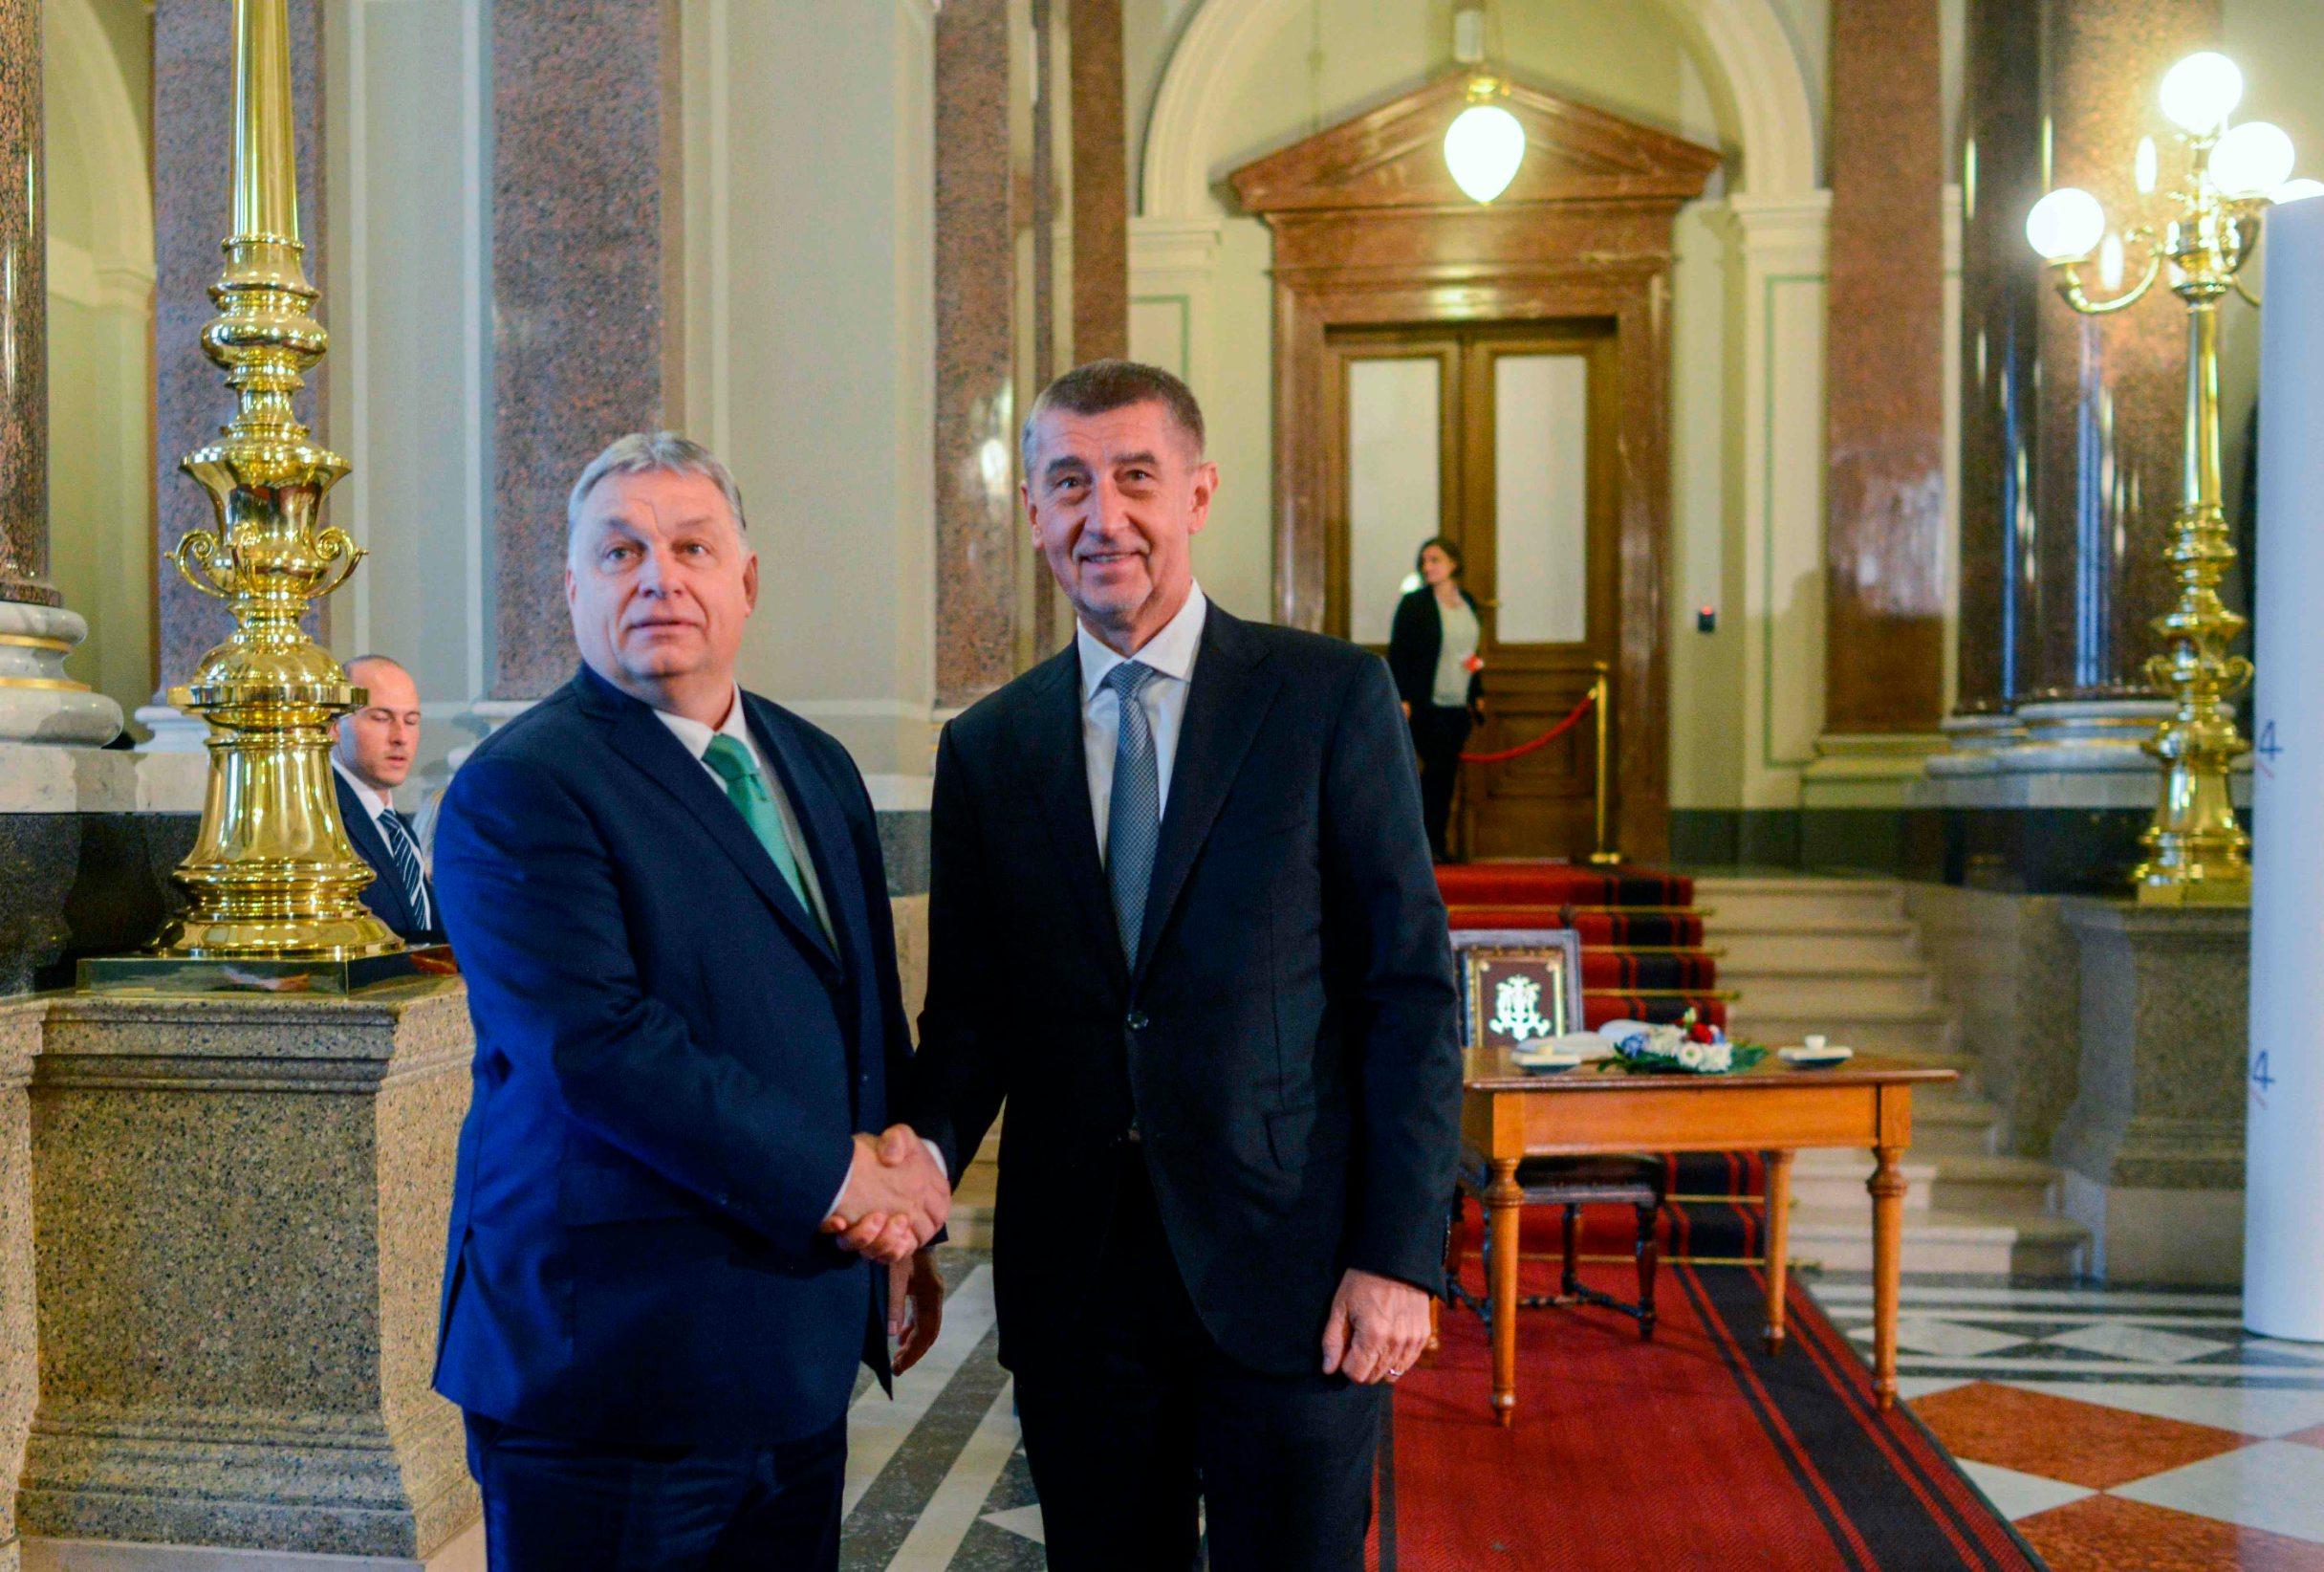 Mađarski premijer Viktor Orban i češki kolega Andrej Babiš. Prema pisanju nekih mađarskih medija, Babiš je zahvaljujući prijateljstvu s Orbanom stekao zavidan vlasnički udjel u mađarskoj poljoprivredi